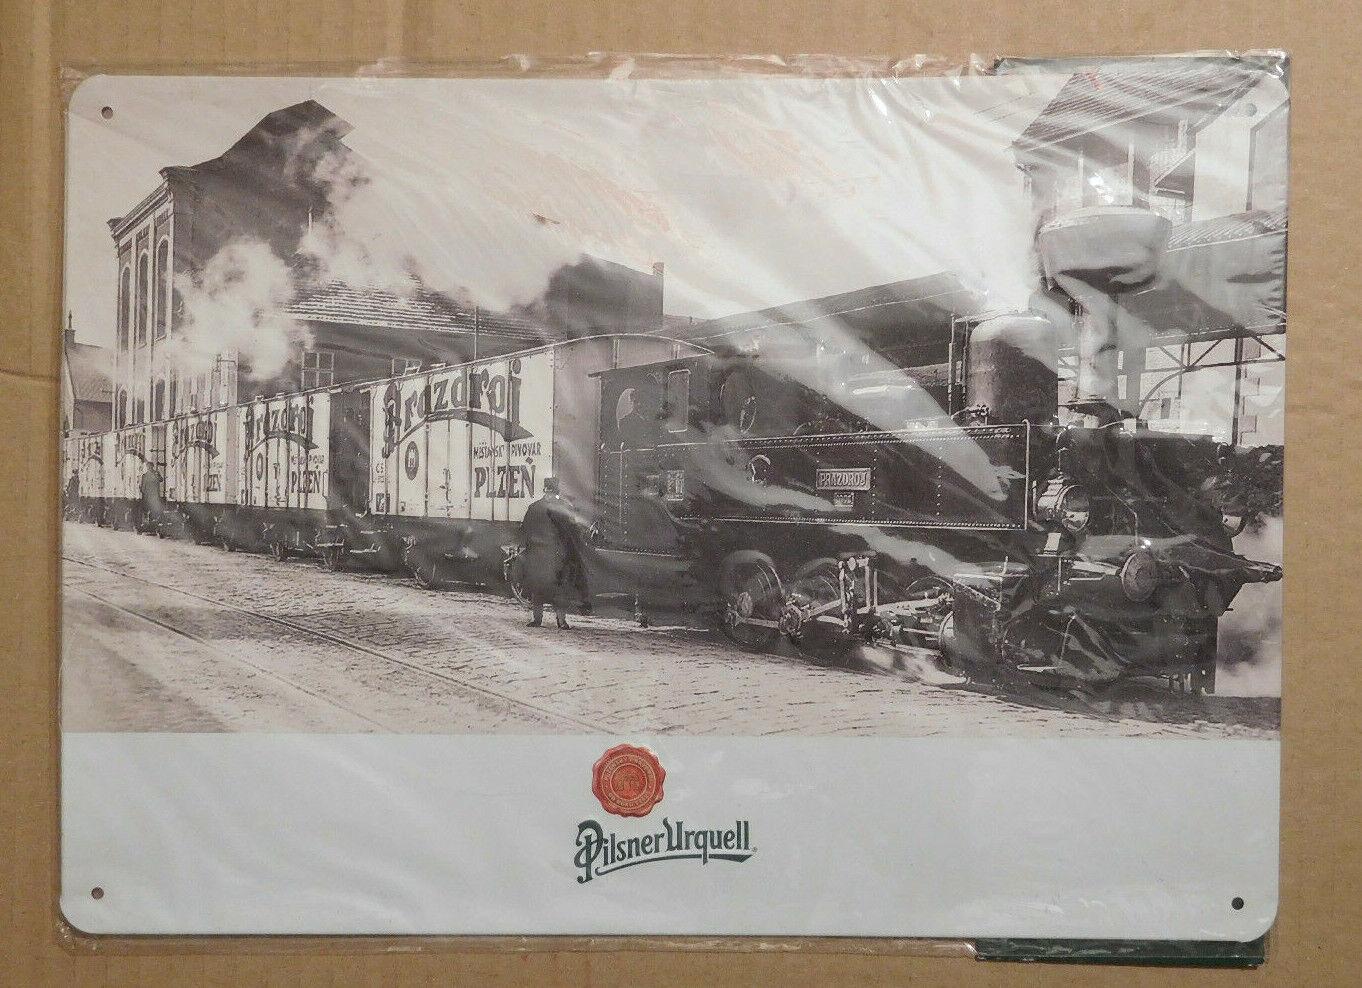 Neu) Blechschild Pilsner Urquell Eisenbahn Bierwagen Zug , geprägt 30x20cm